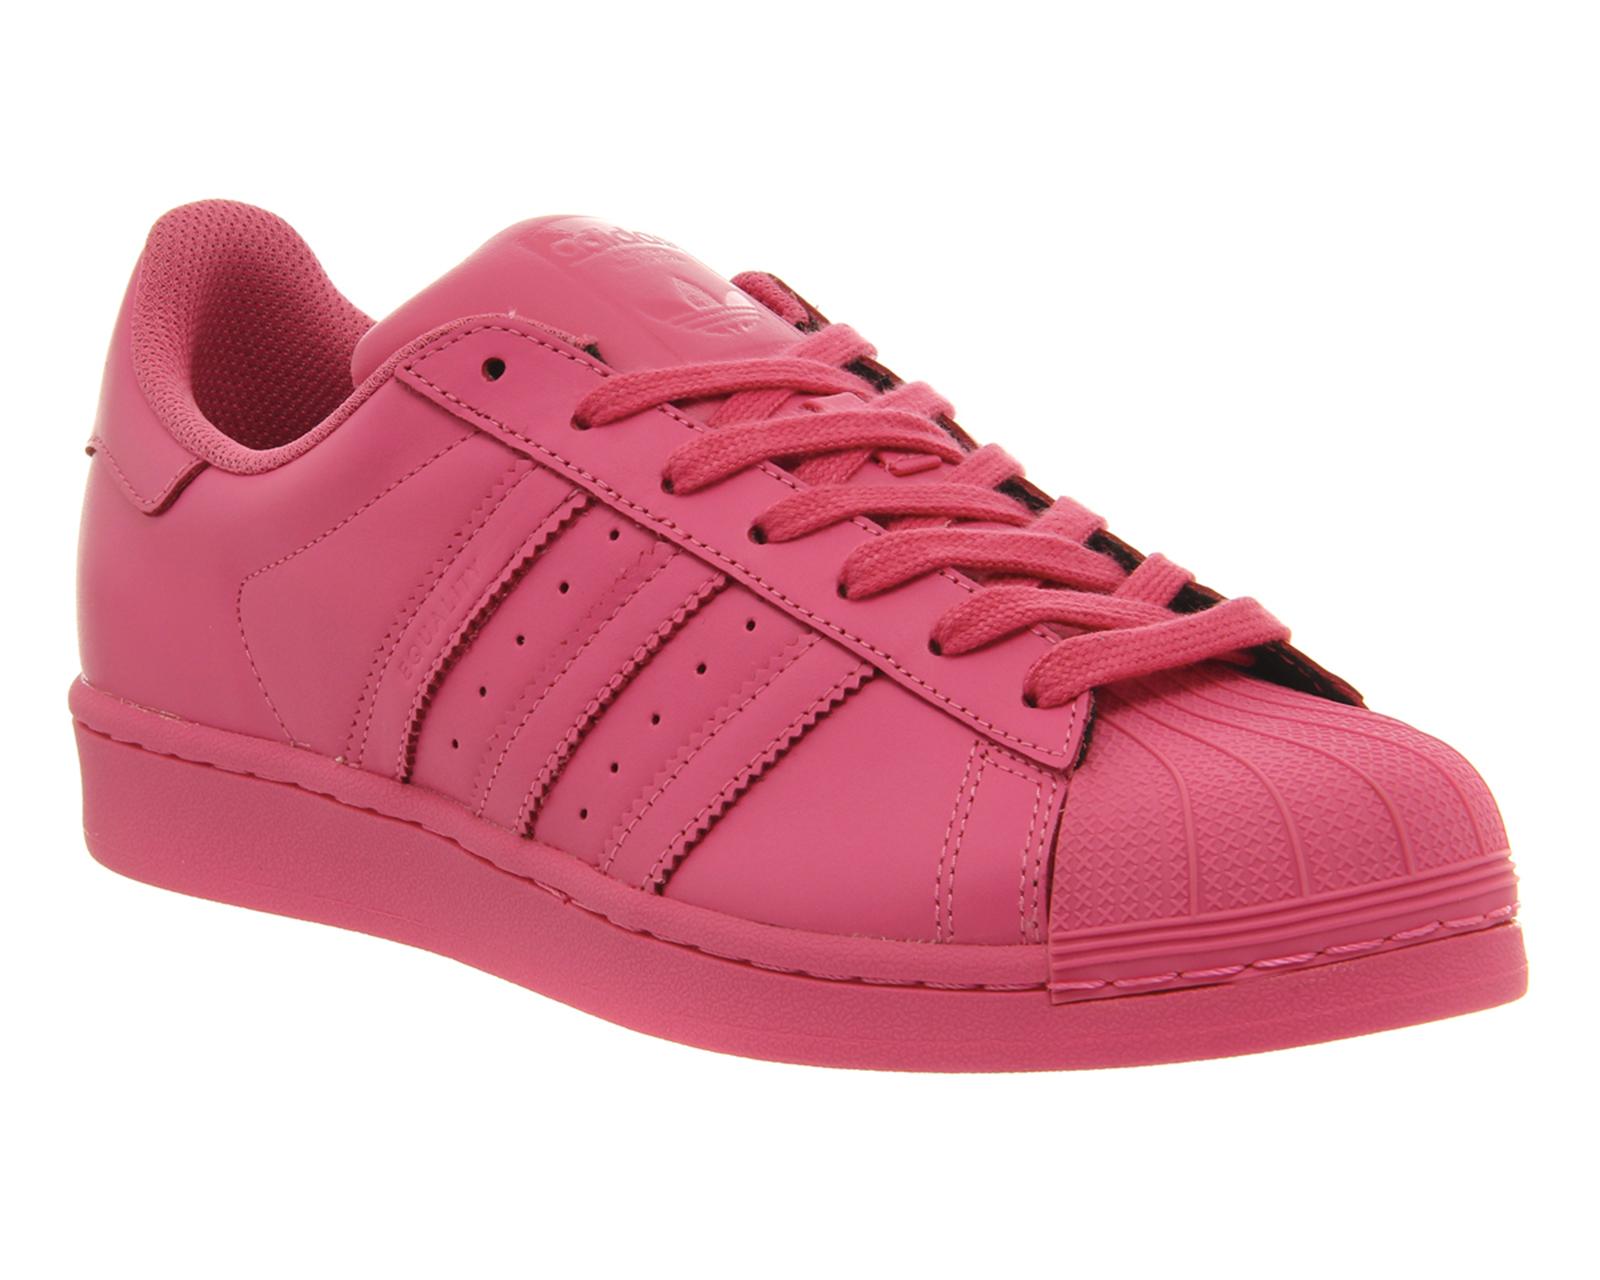 Adidas Superstar Supercolor Price